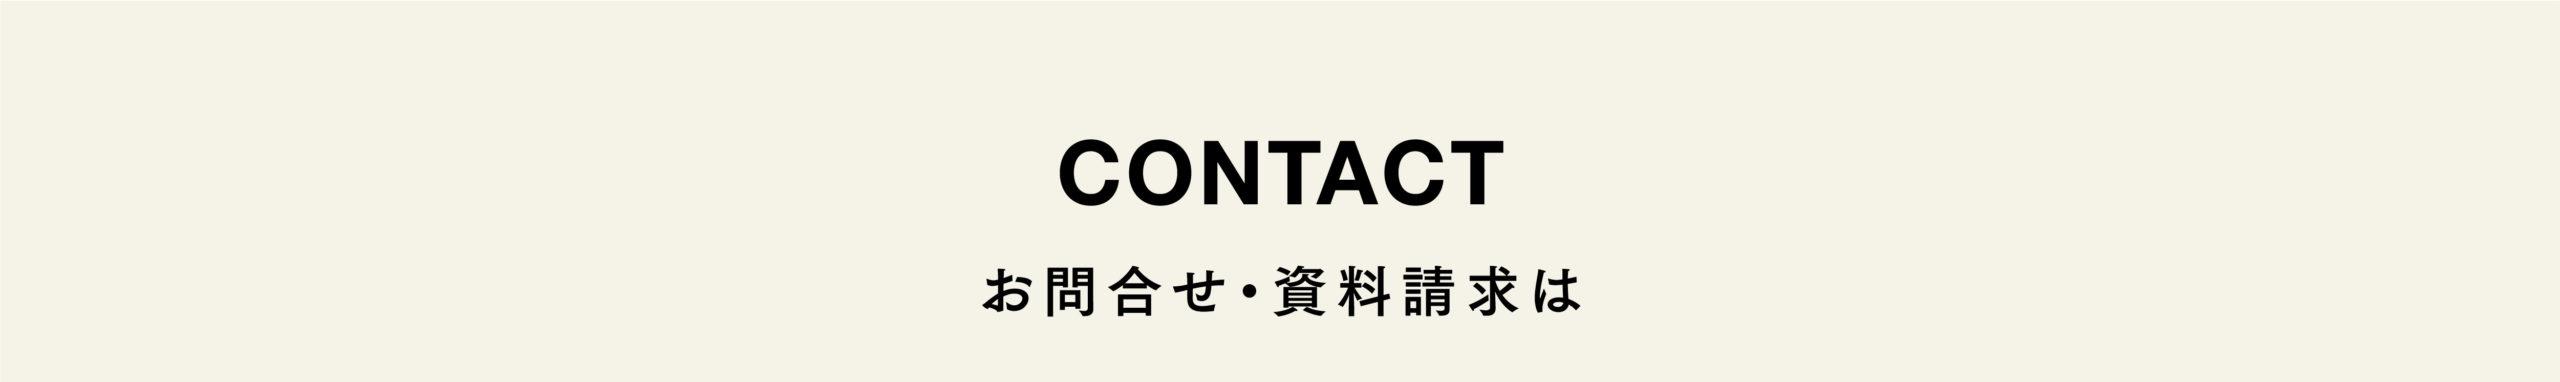 CONTACT お問合せ・資料請求はこちらから。福岡市早良区重留に誕生。福岡県福岡市早良区にある新築一戸建て・土地・宅地「フィットコート重留 (建築条件付宅地分譲)」のご紹介。